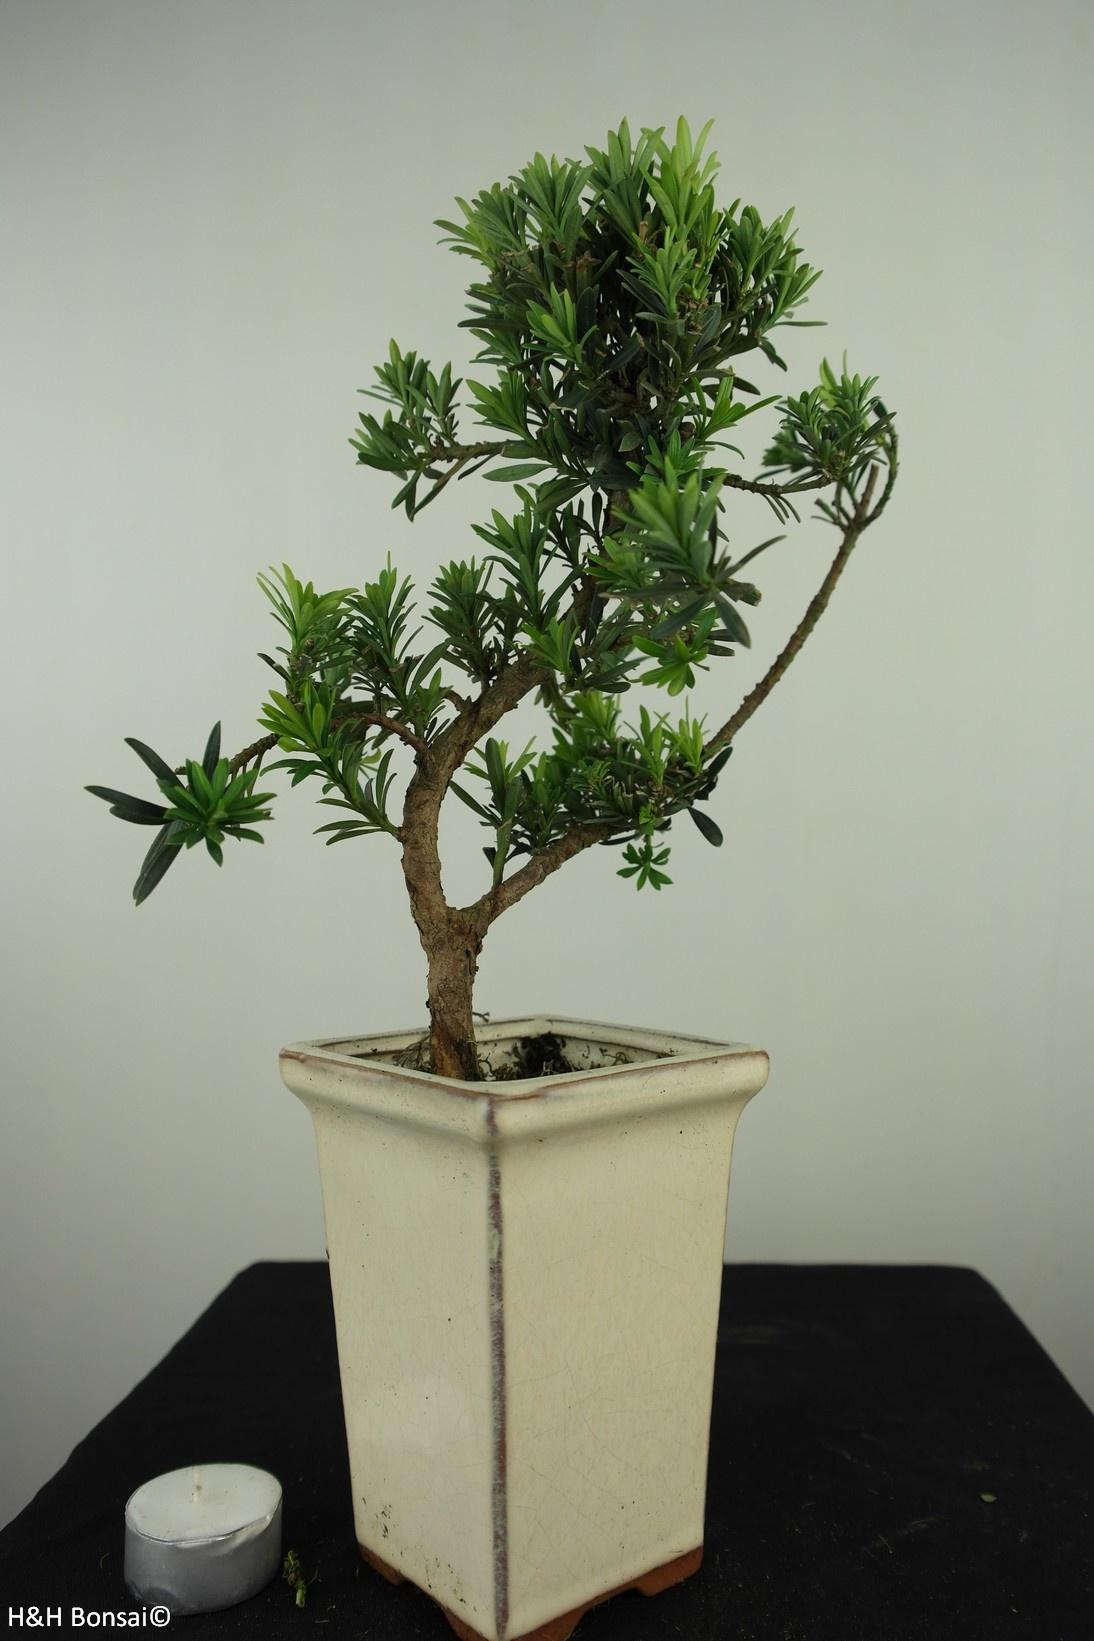 Bonsai Chin. Steineibe, Podocarpus, nr. 7597